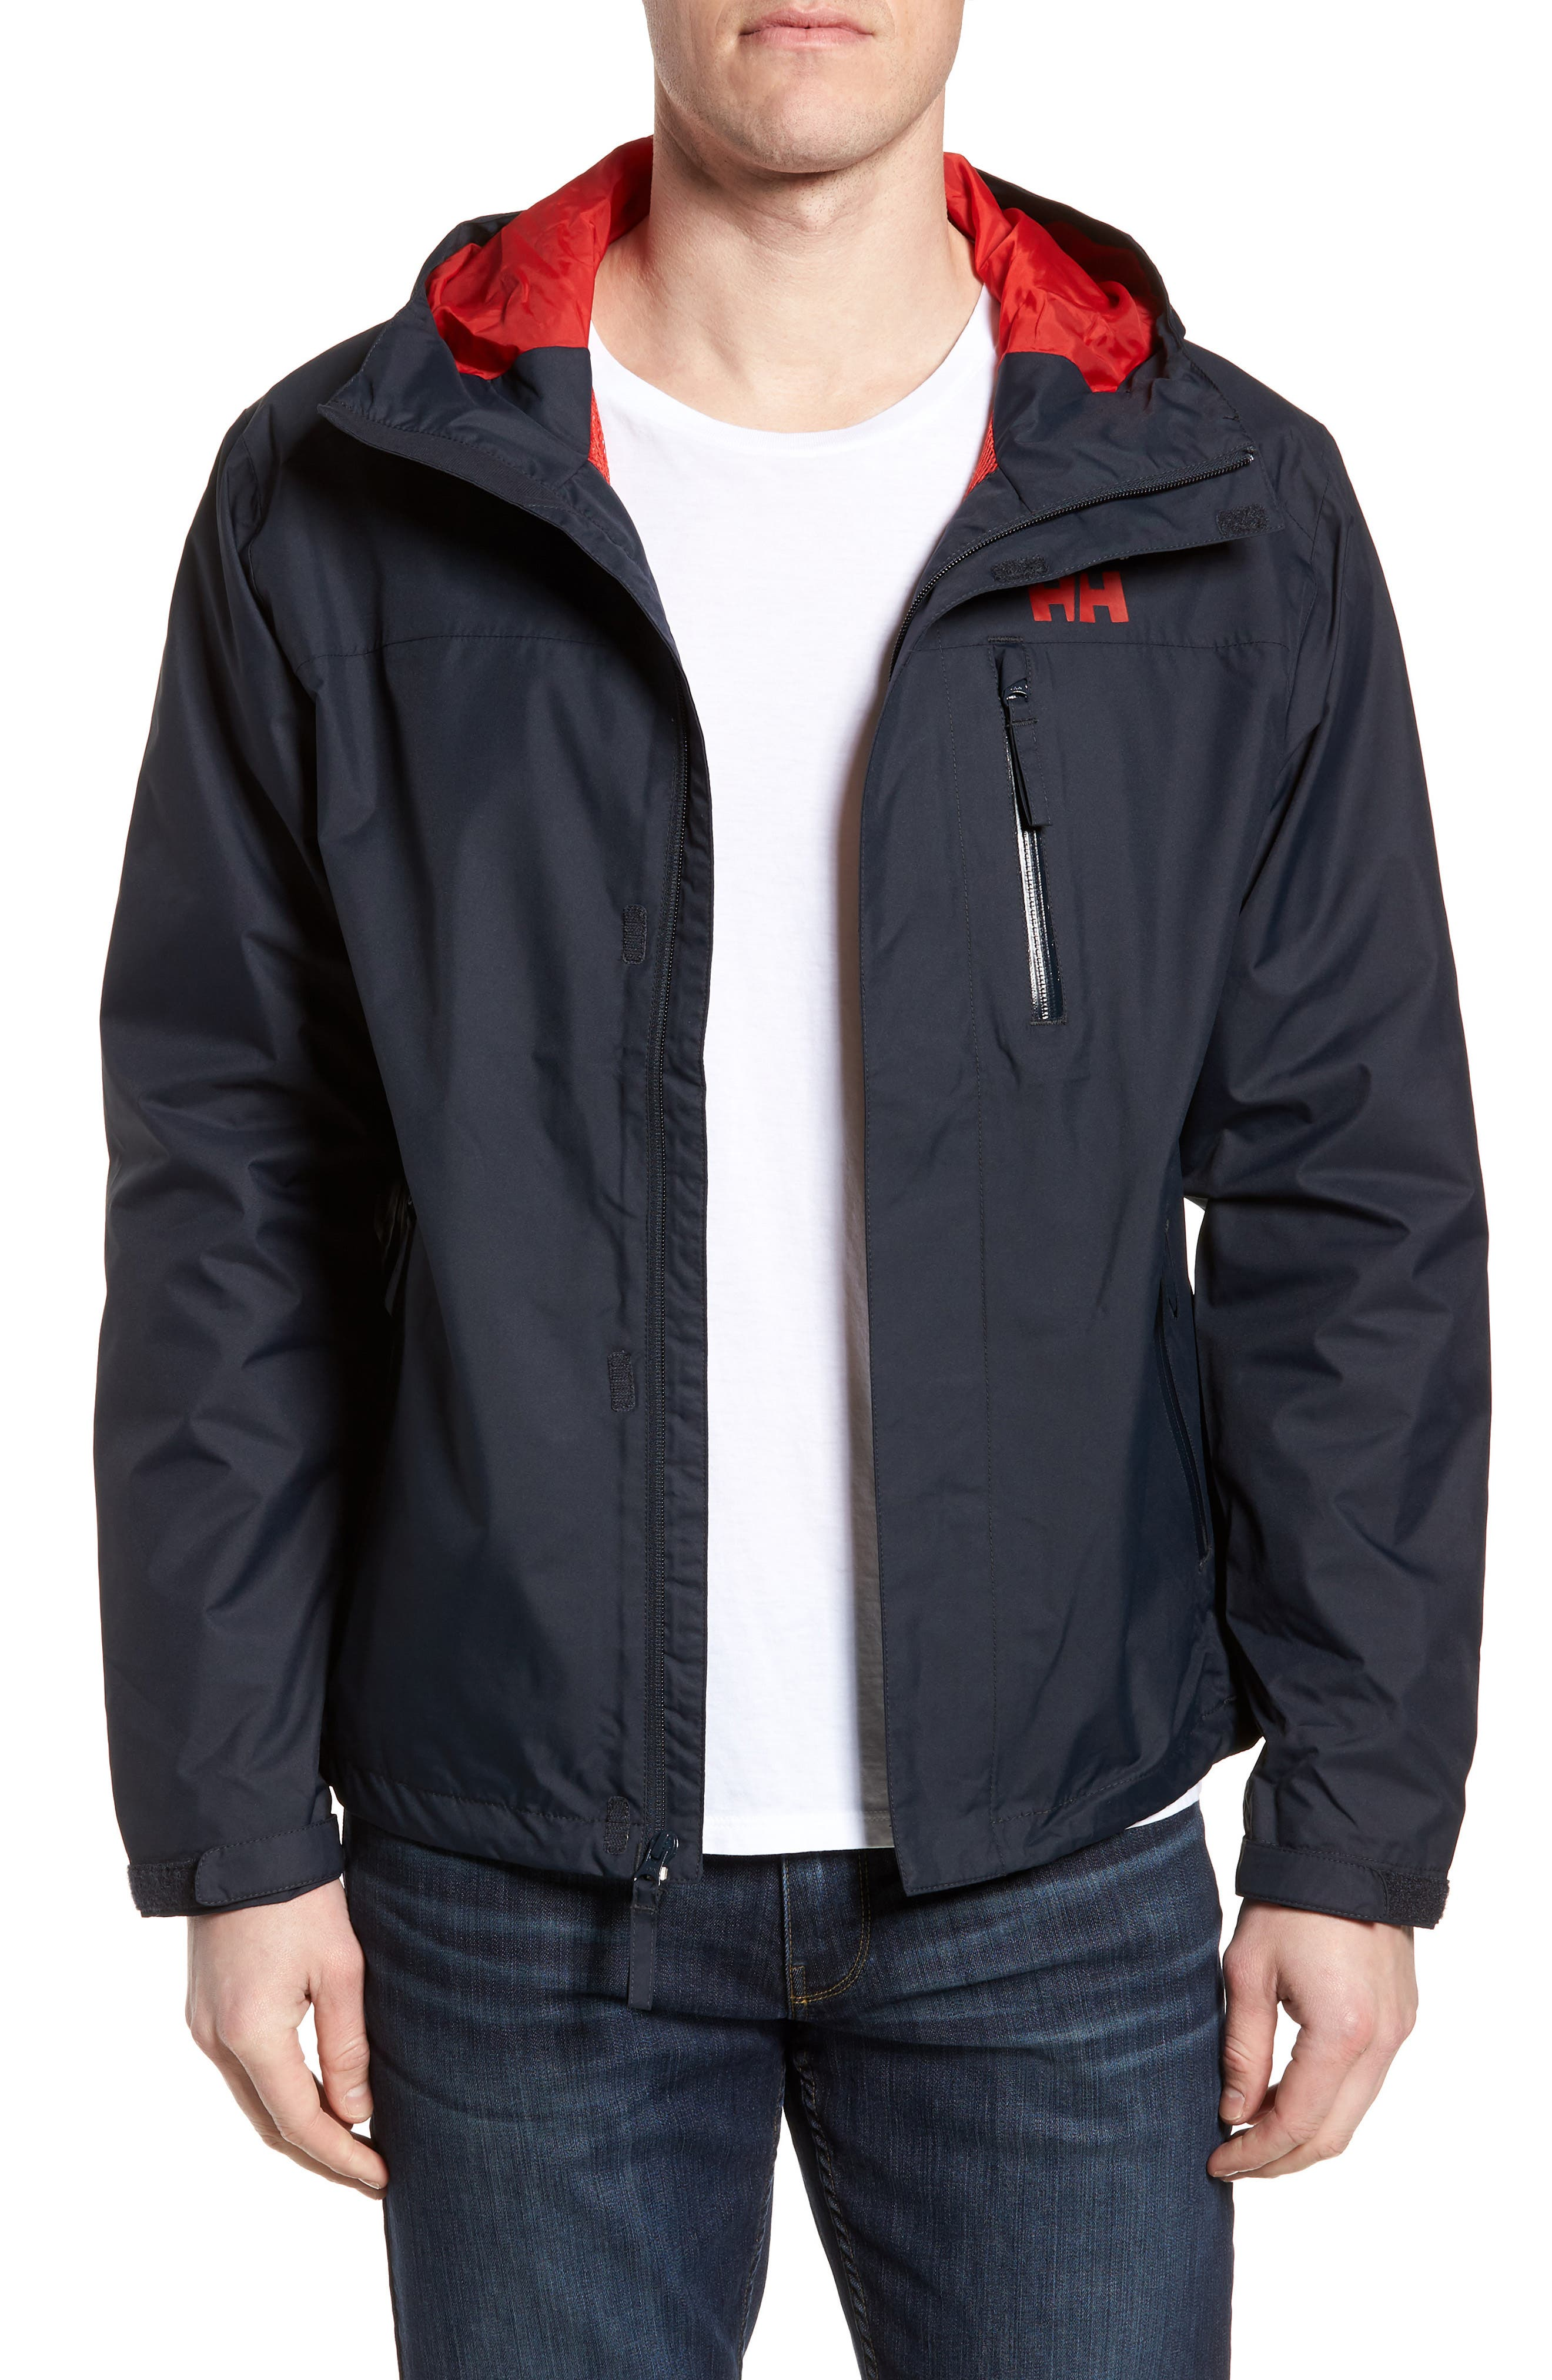 'Vancouver' Packable Rain Jacket,                             Main thumbnail 1, color,                             Navy/ Navy